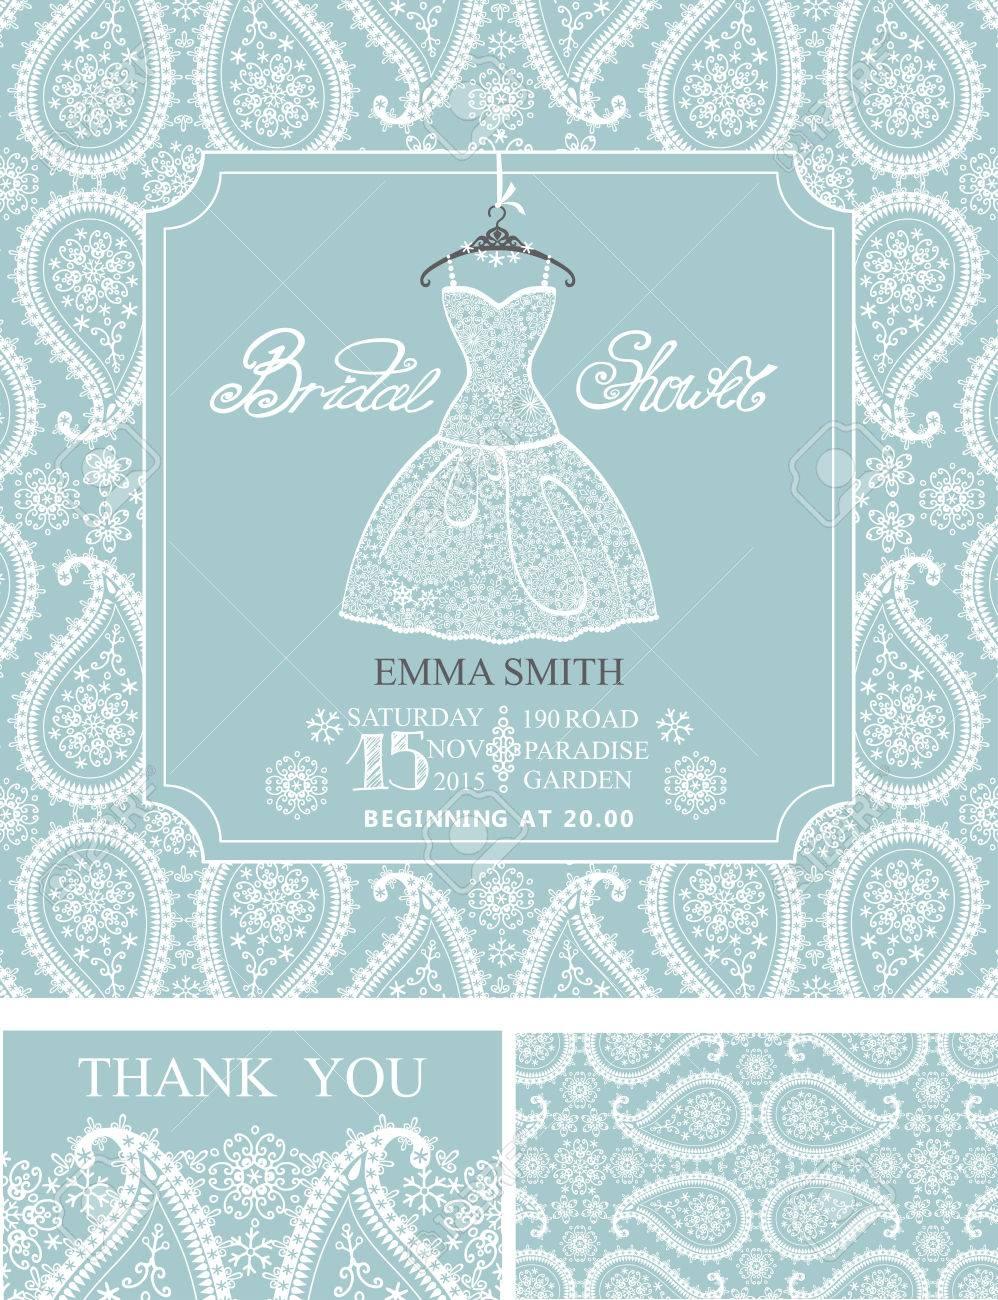 Bridal Shower Invitation Set.Bridal Wedding Dress,paisley Lace ...